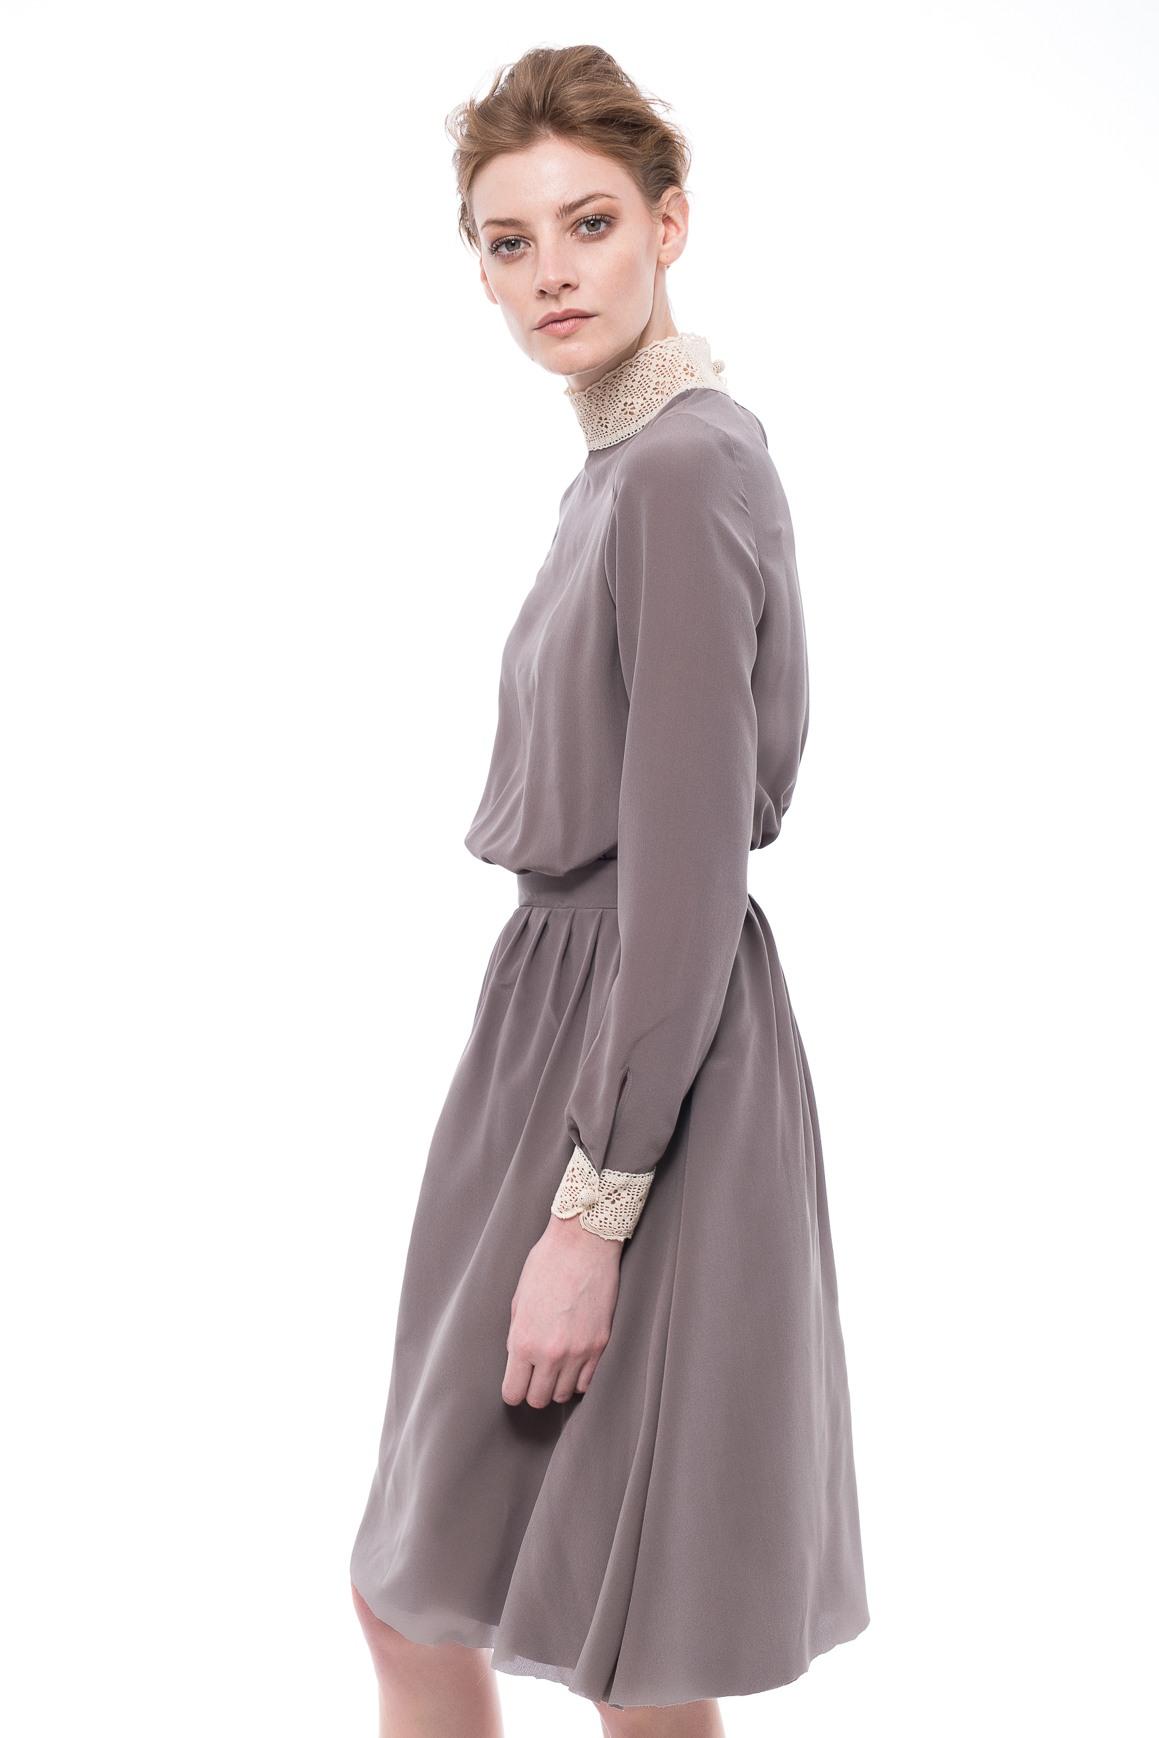 Stand Collar Dress Designs : Stand up collar silk dress chemistry studio